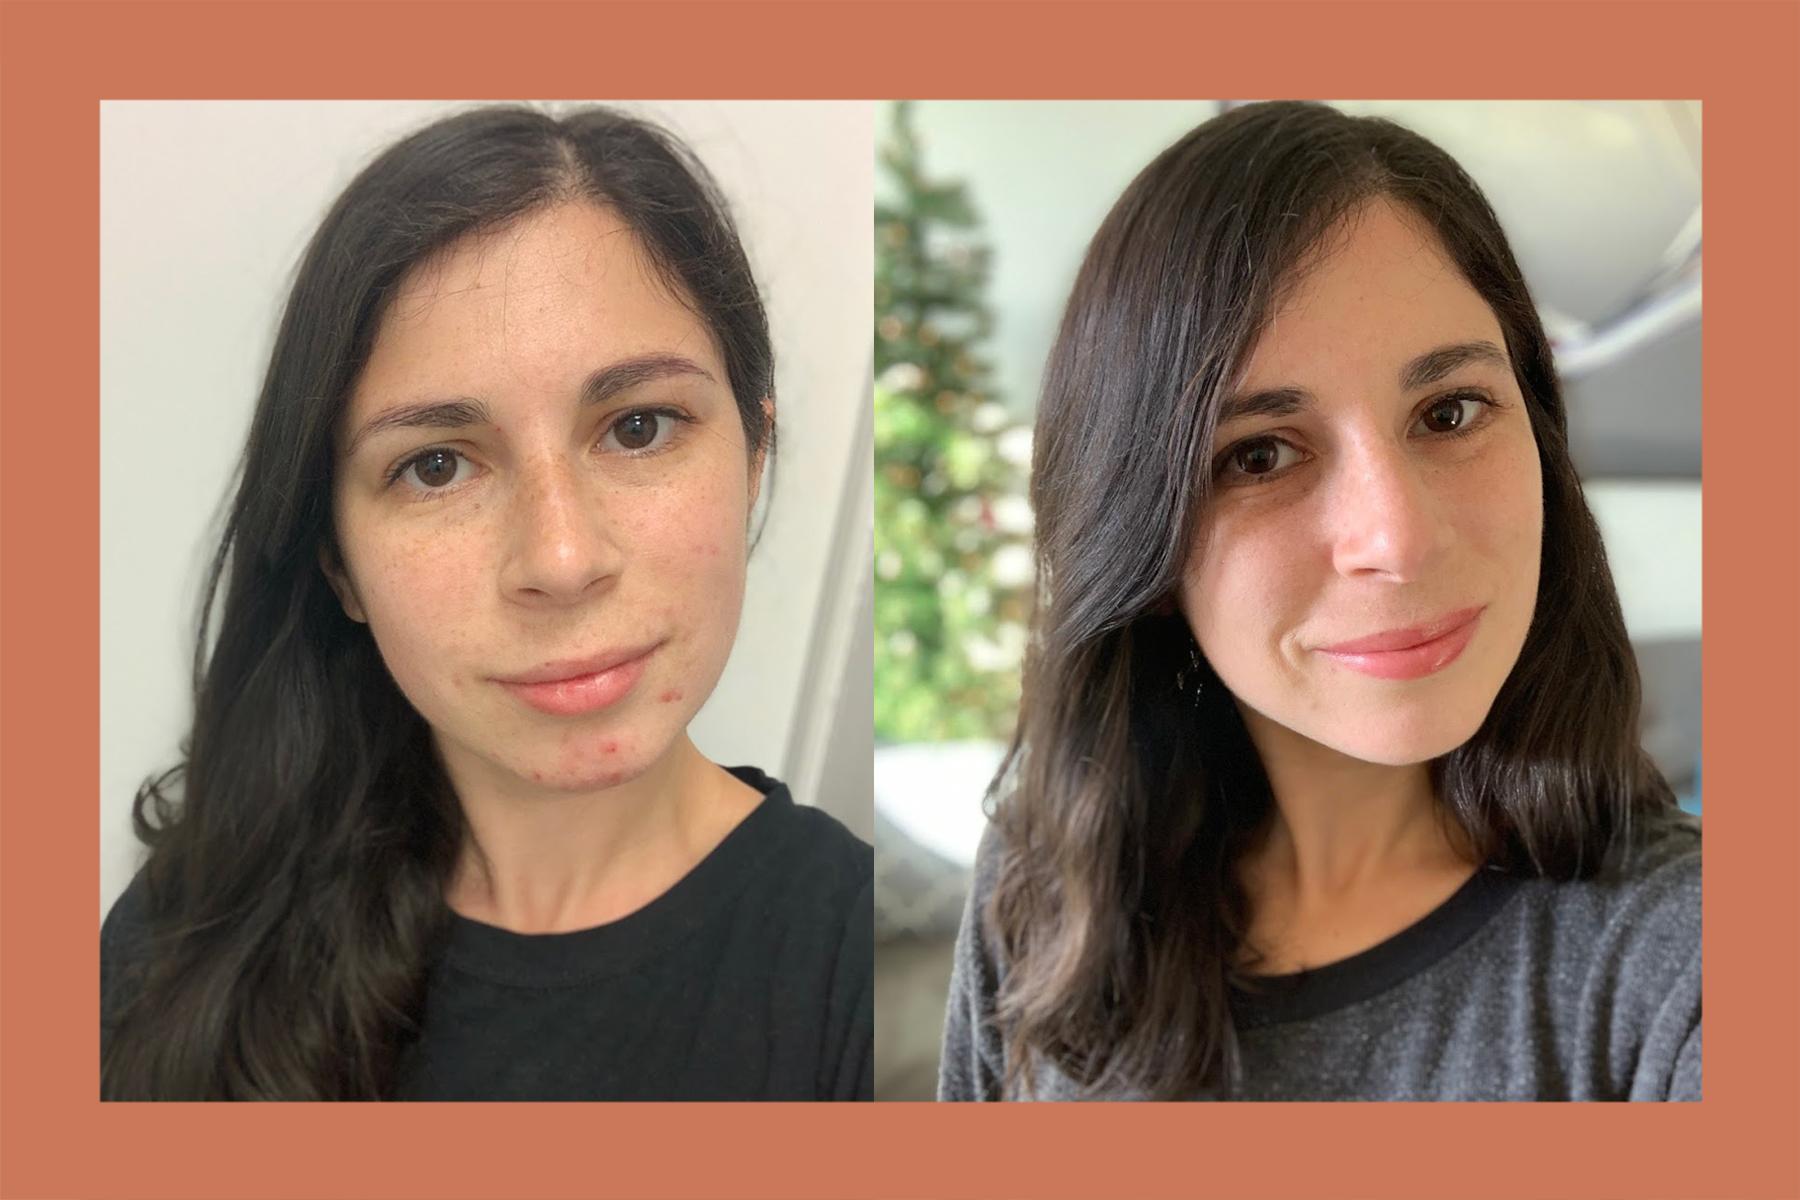 Rachel-Before-After